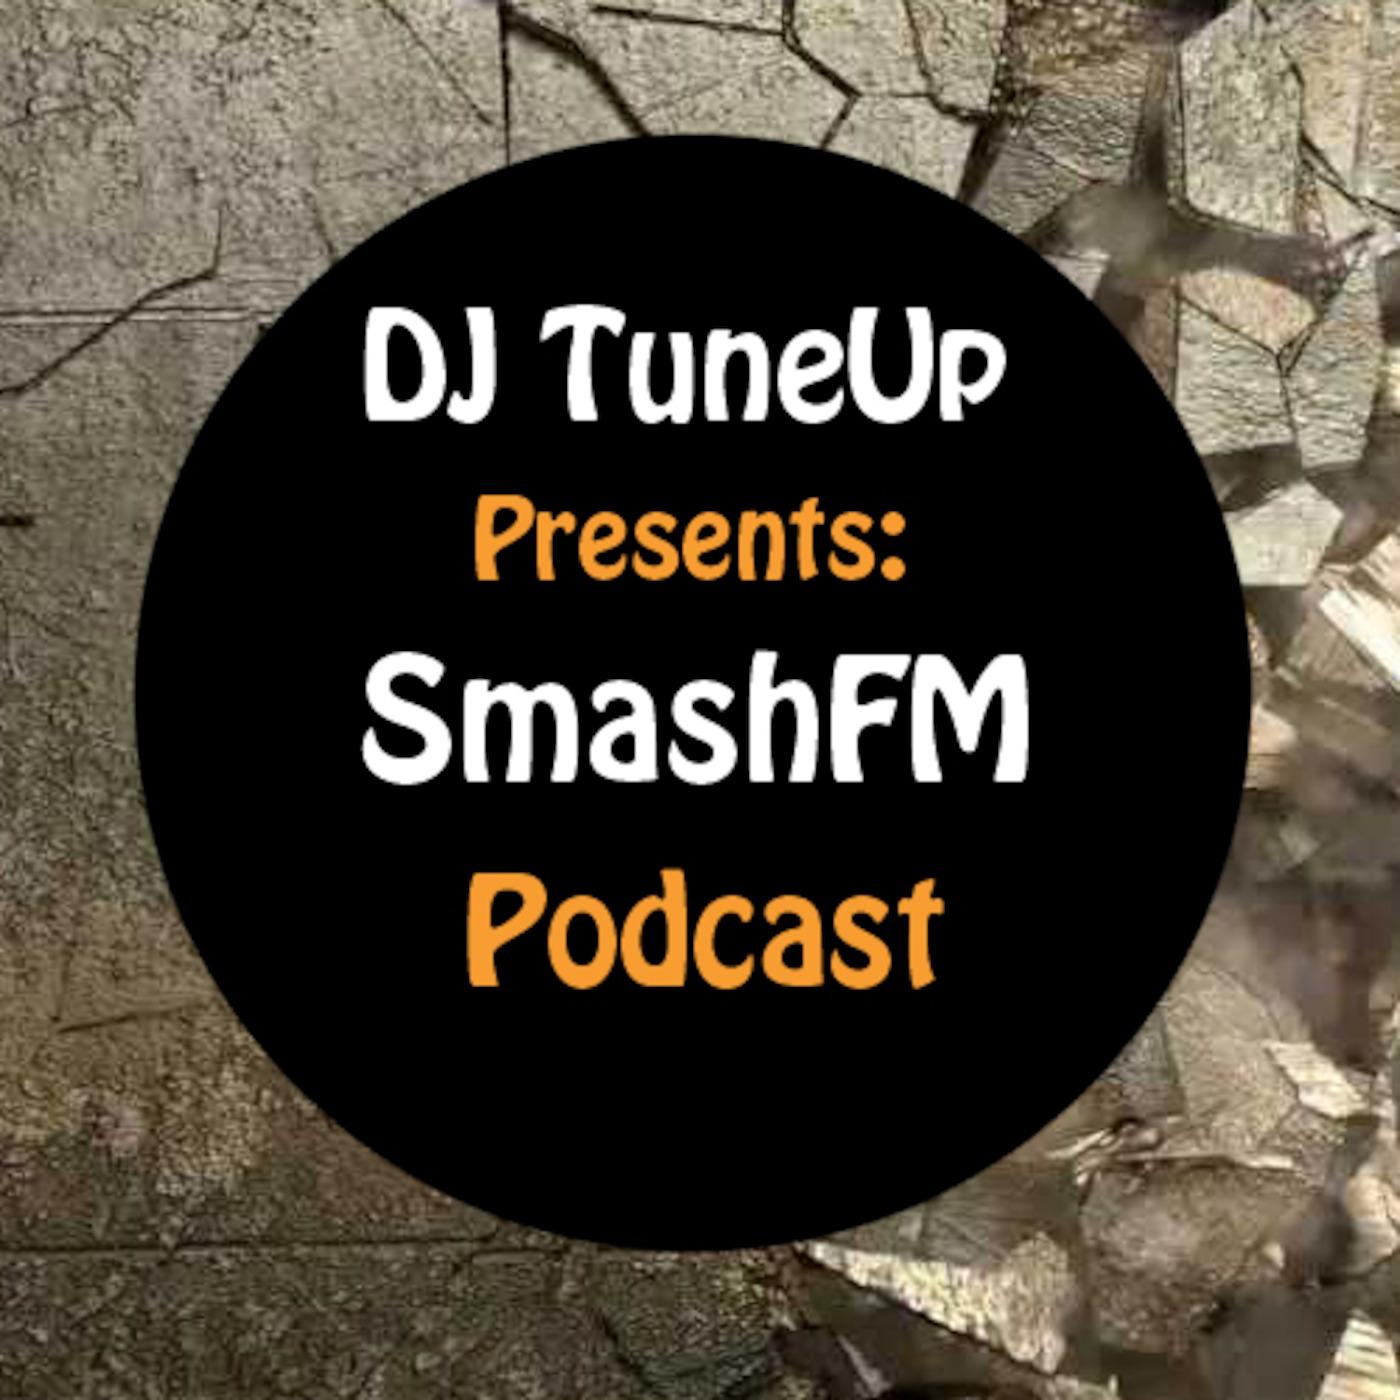 DJ TuneUp's SmashFM Podcast